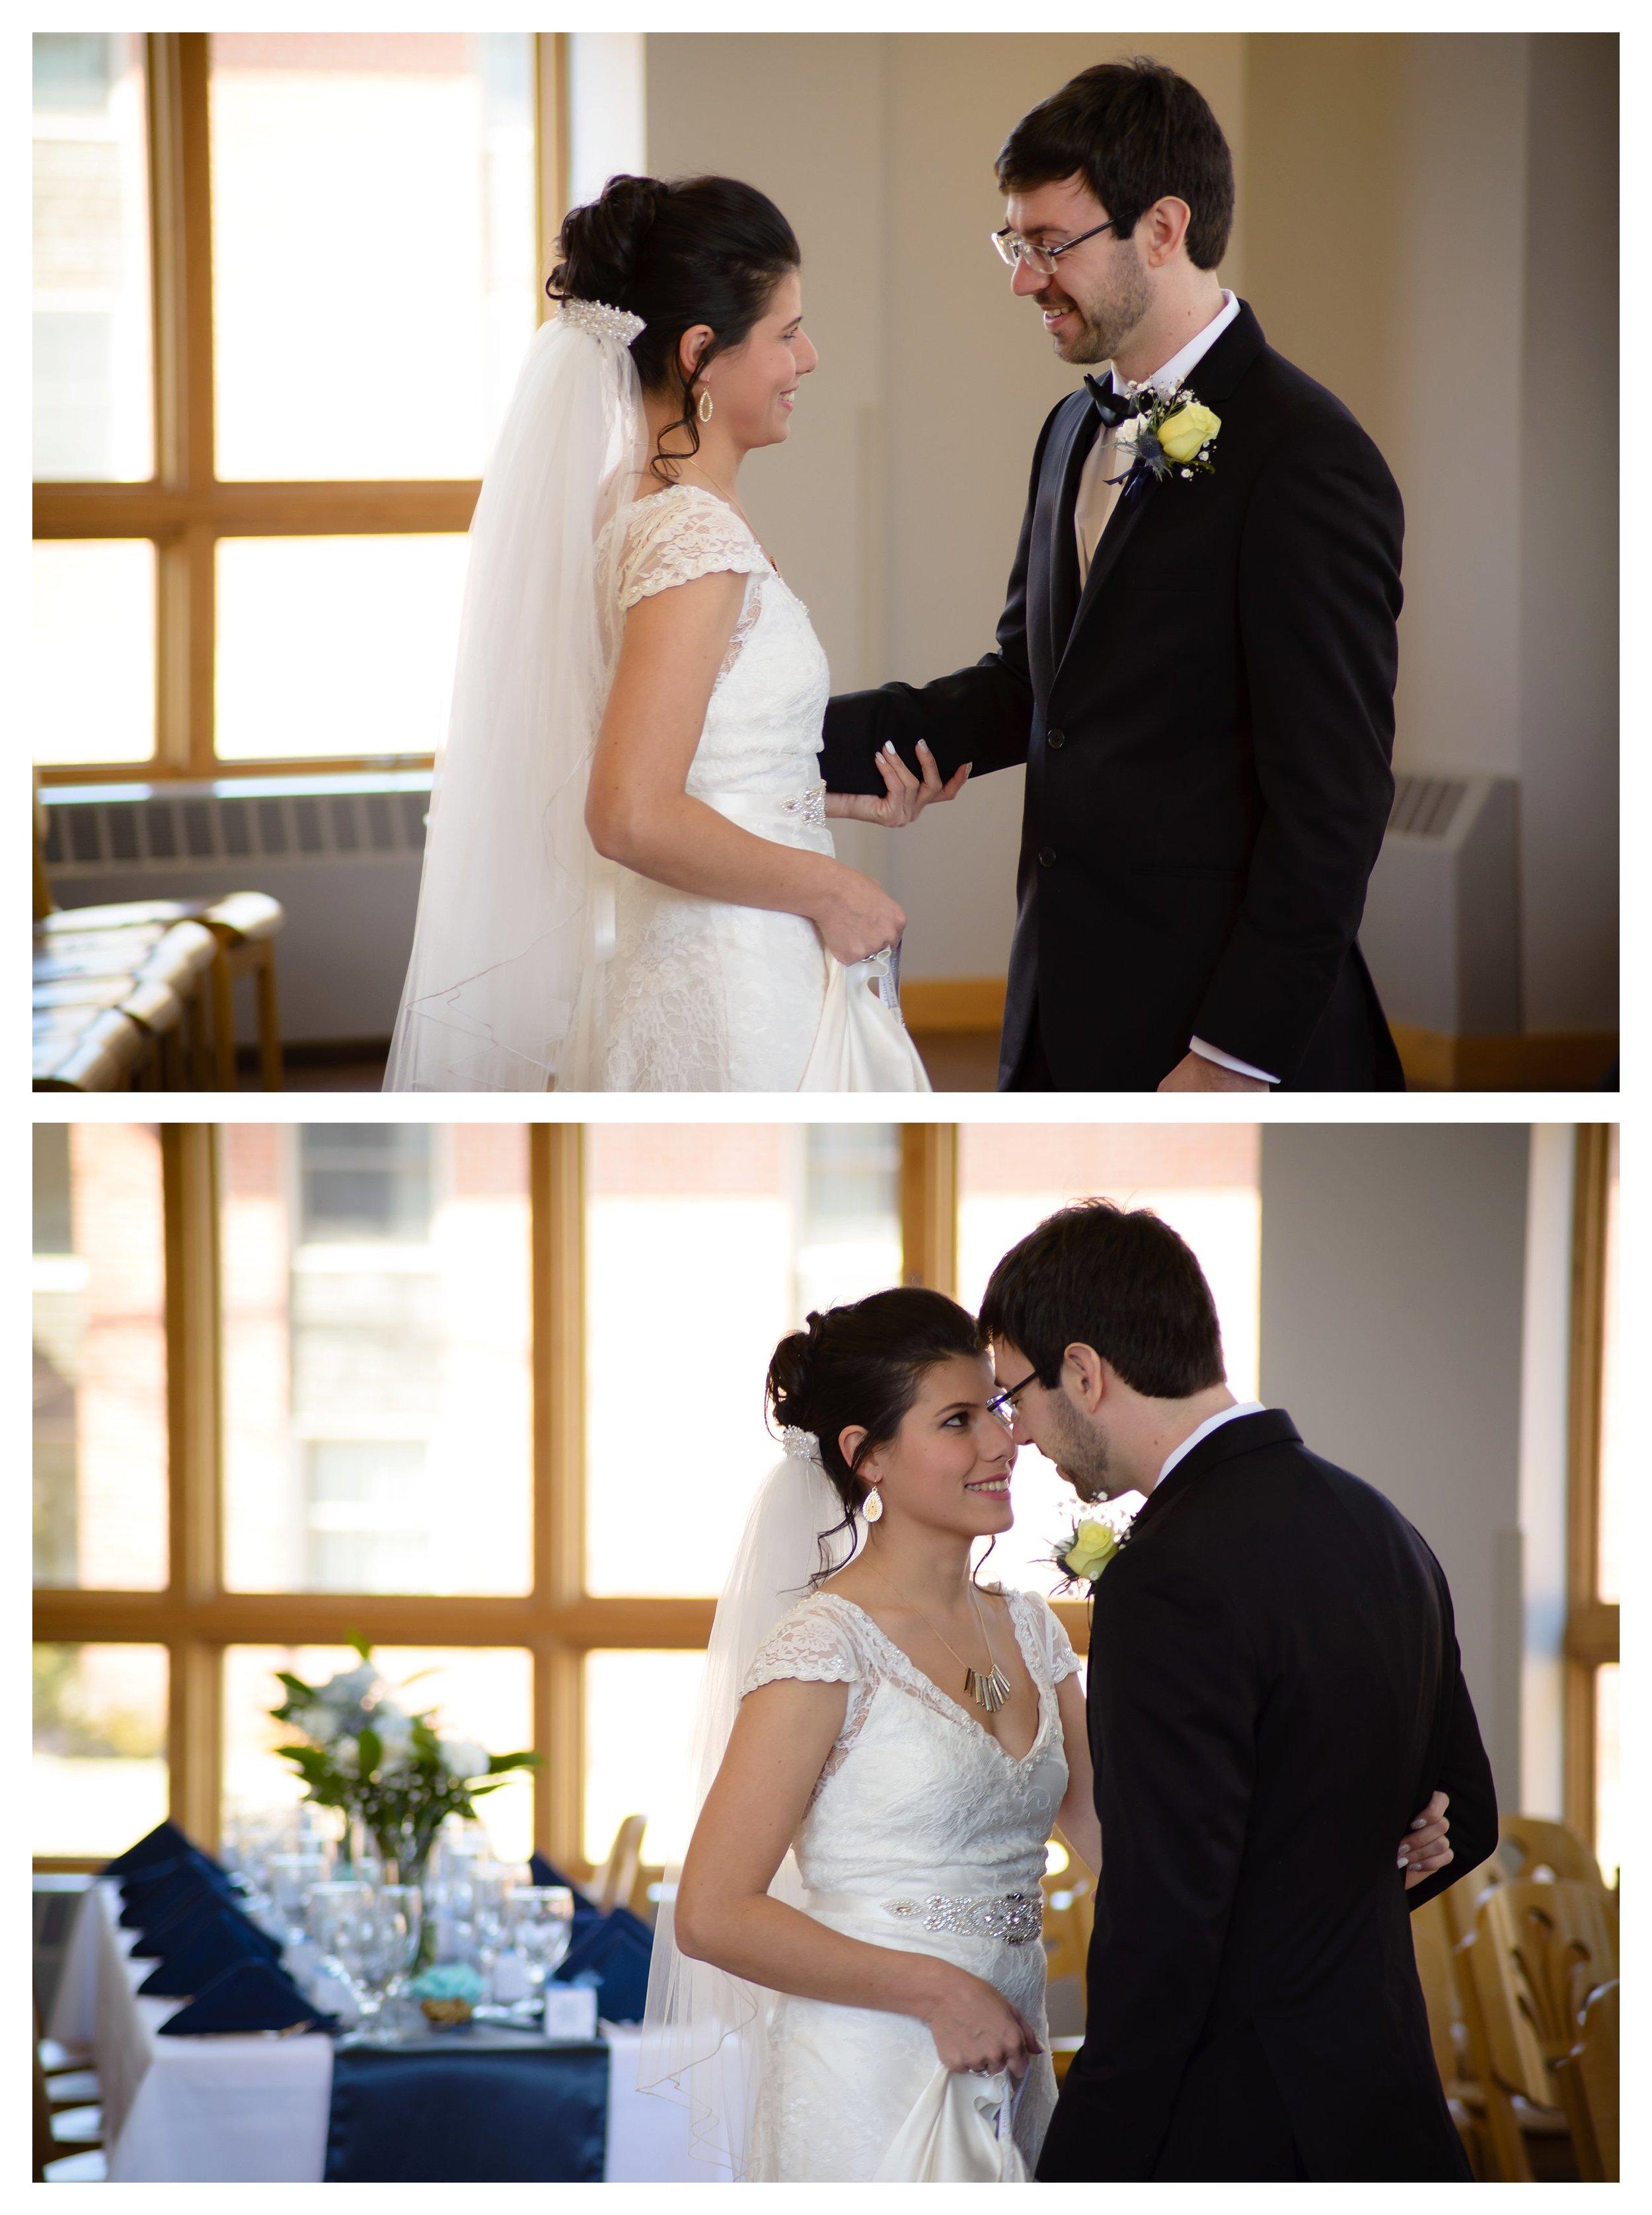 ashland wedding photographer iron river brule wisconsin ps 139 photography jen jensen_0127.jpg